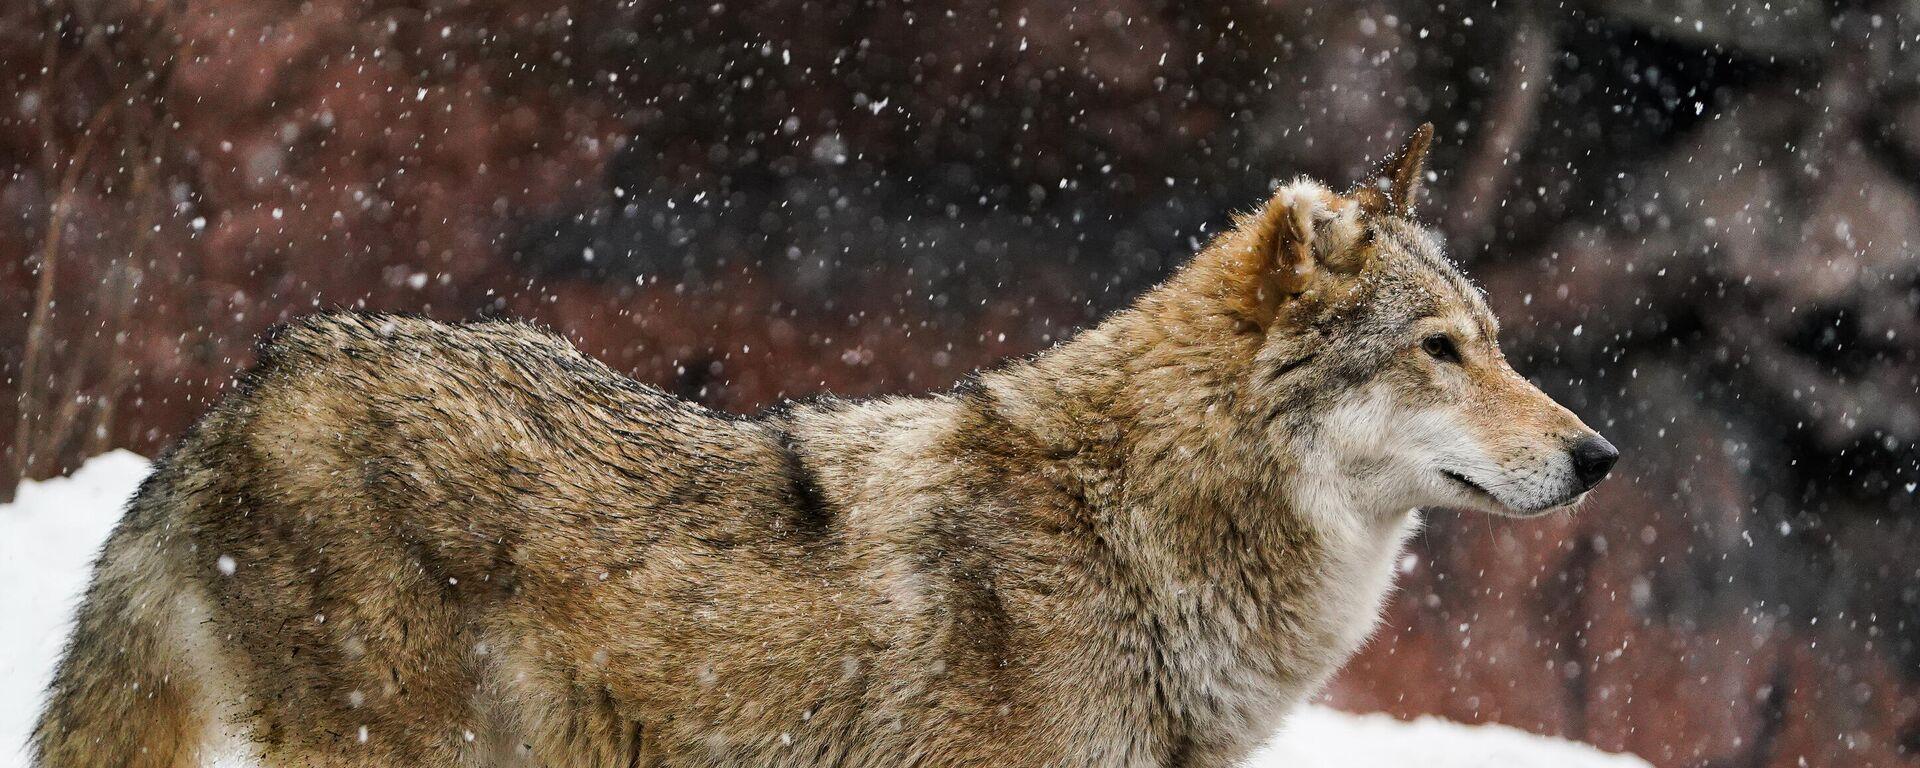 Wolf (Symbolbild) - SNA, 1920, 19.04.2021